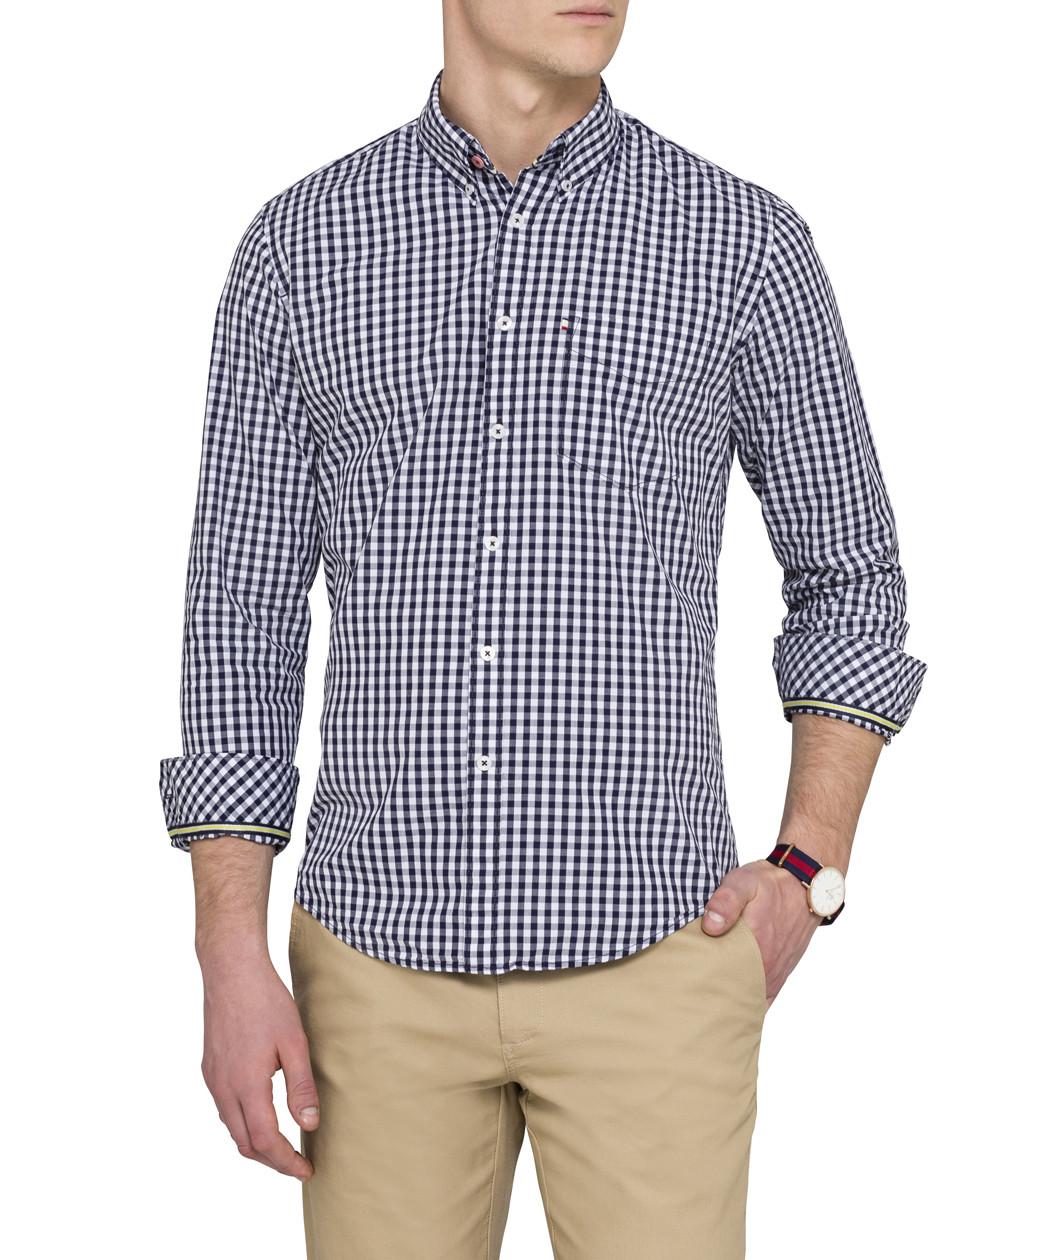 Gingham Mens Dress Shirt